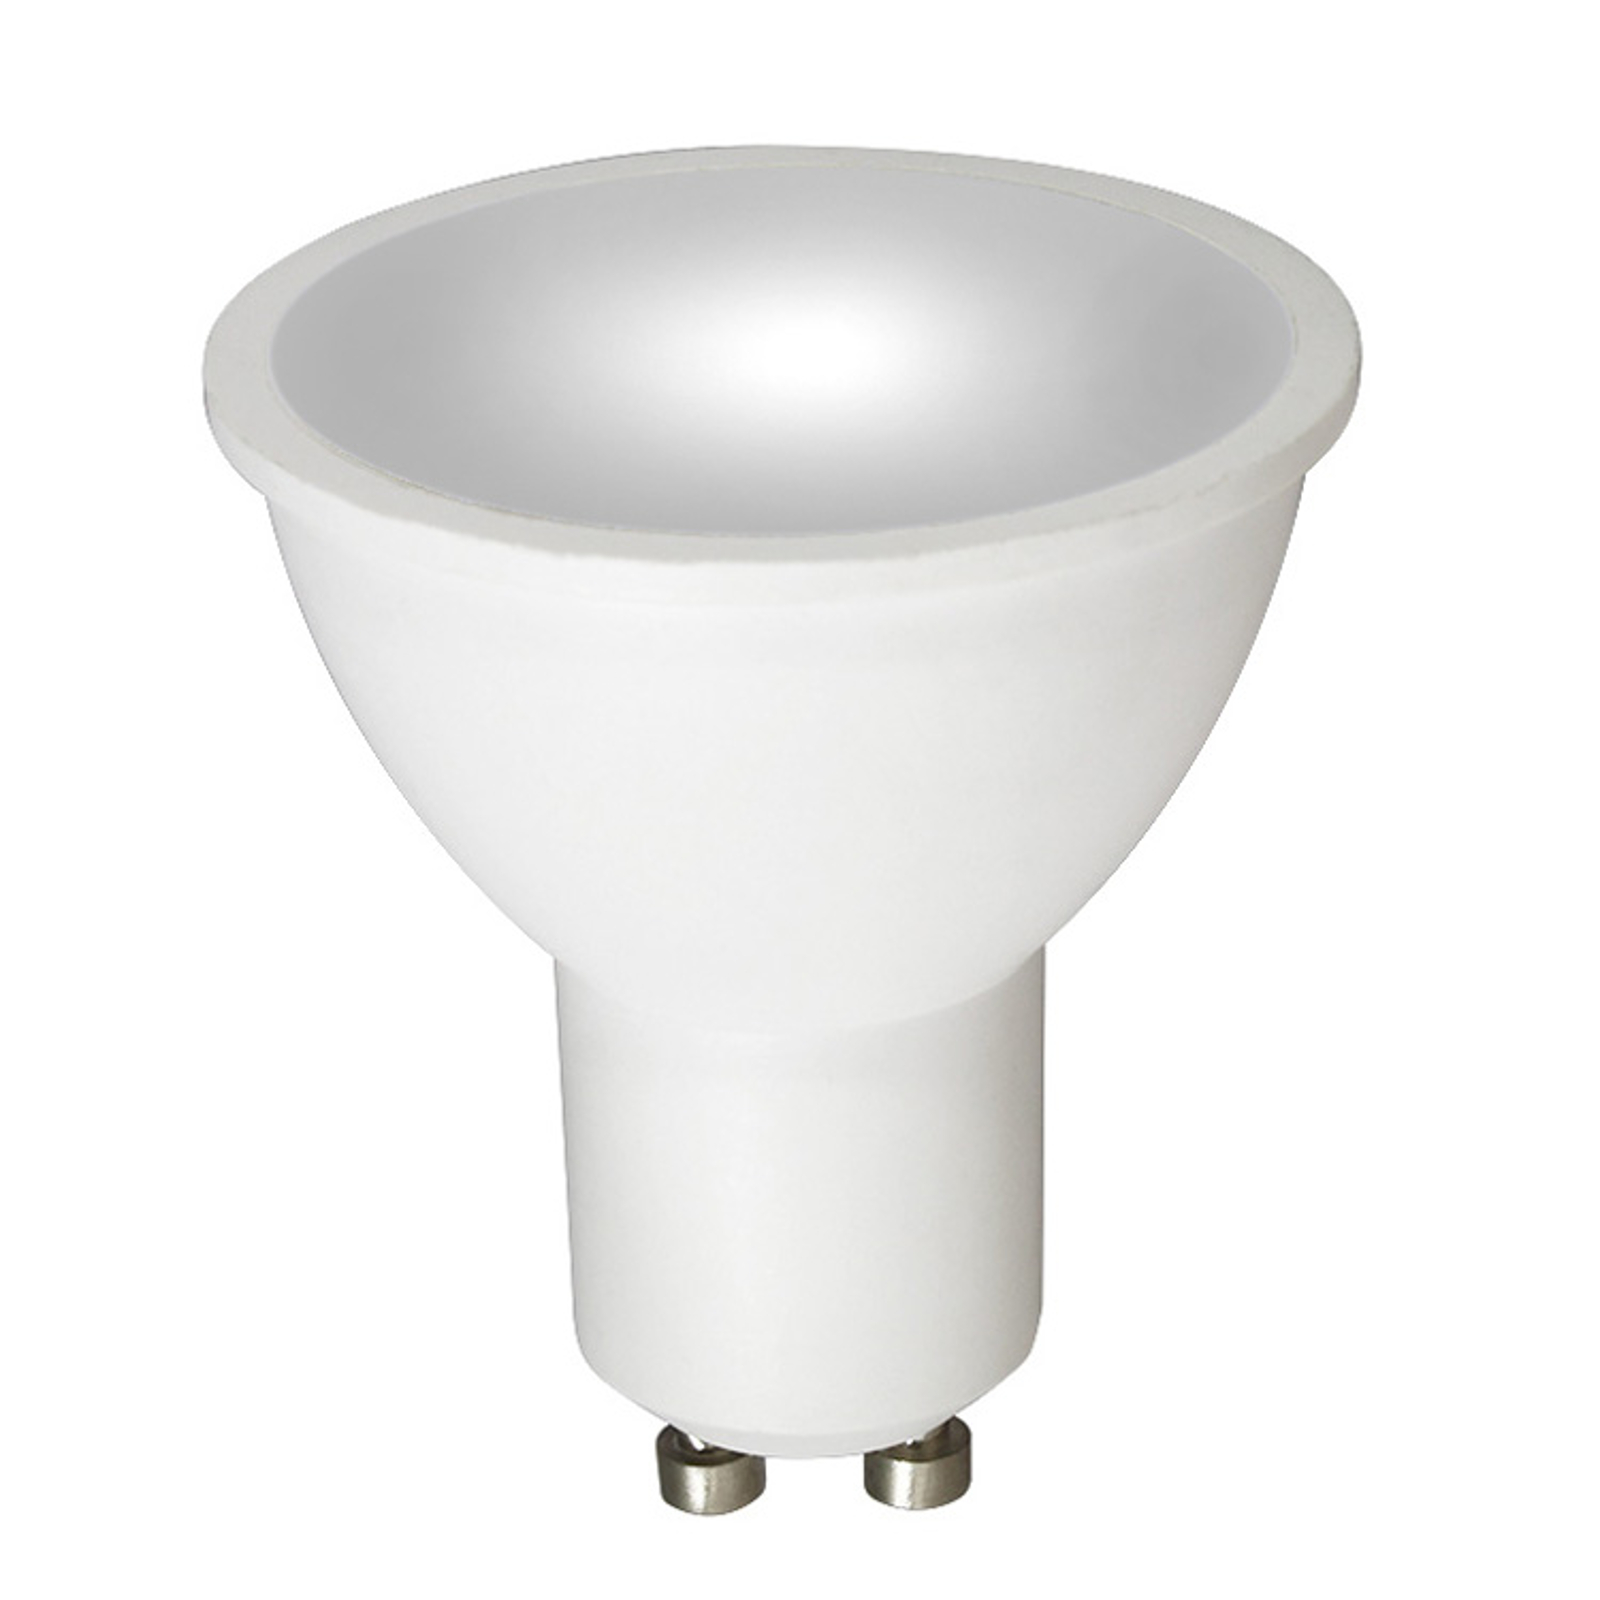 LED-Reflektor KADO GU10 7,5W 120° 3.000K